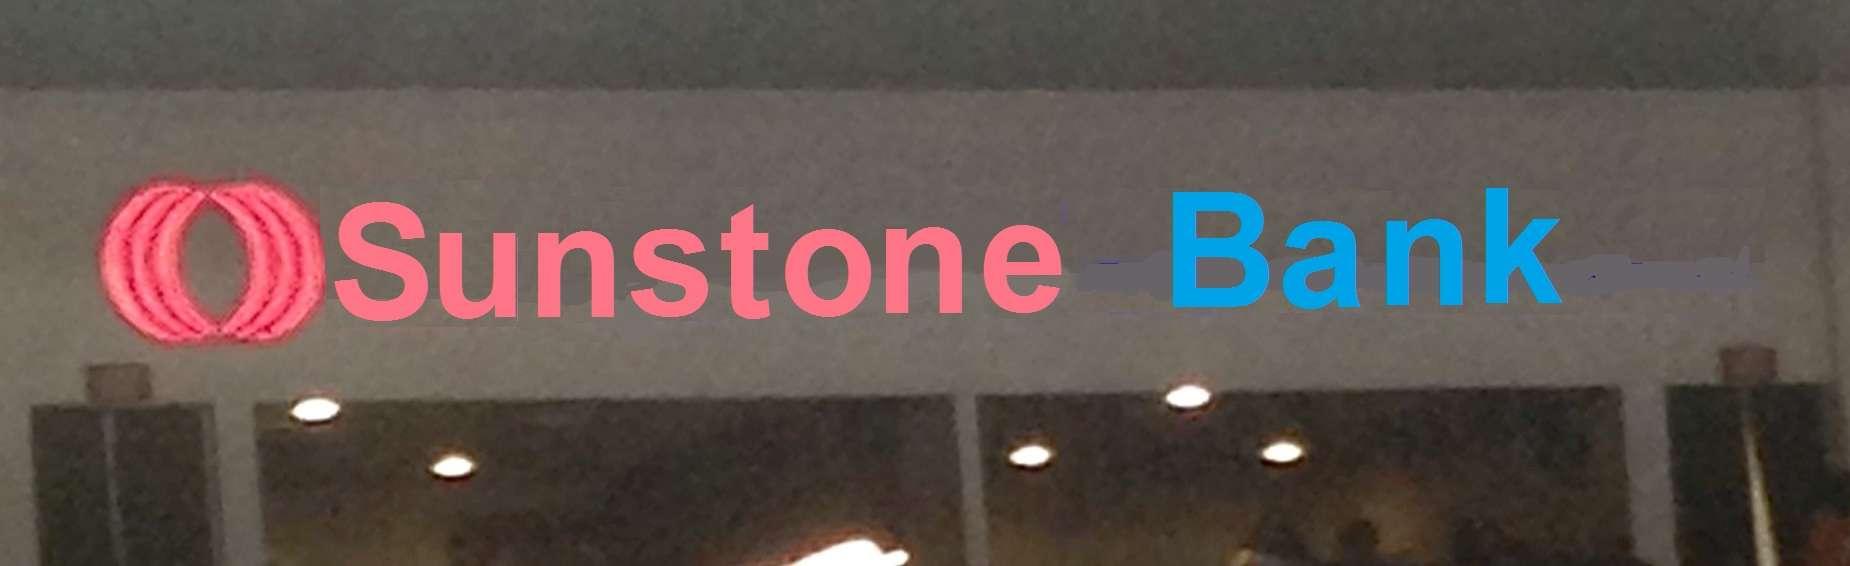 Sunstone Bank